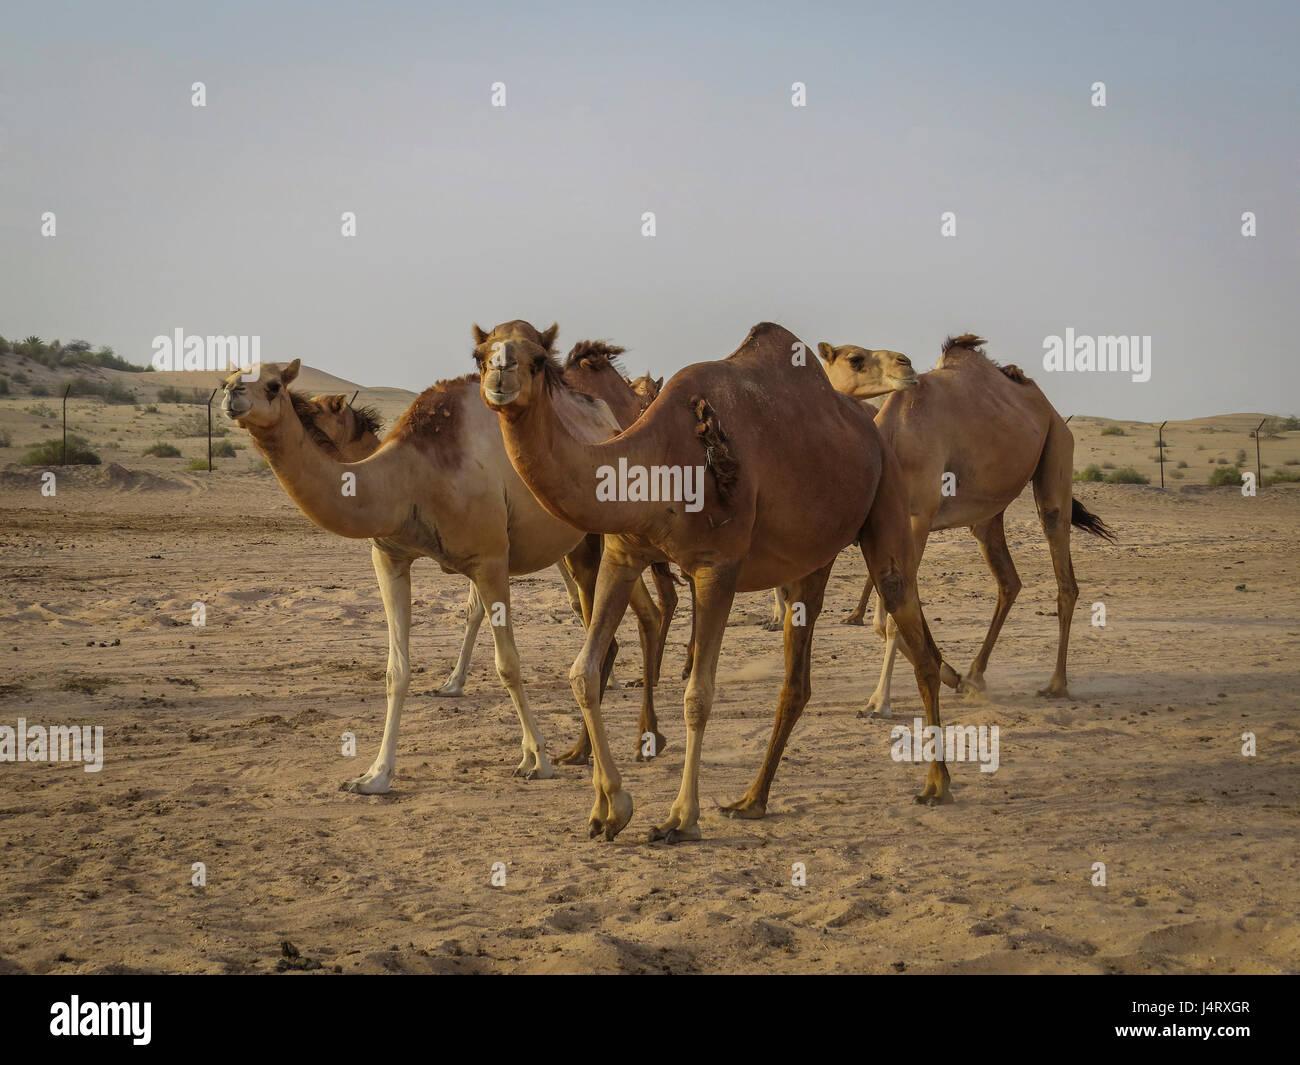 Camels feeding on a camel farm at dusk Stock Photo